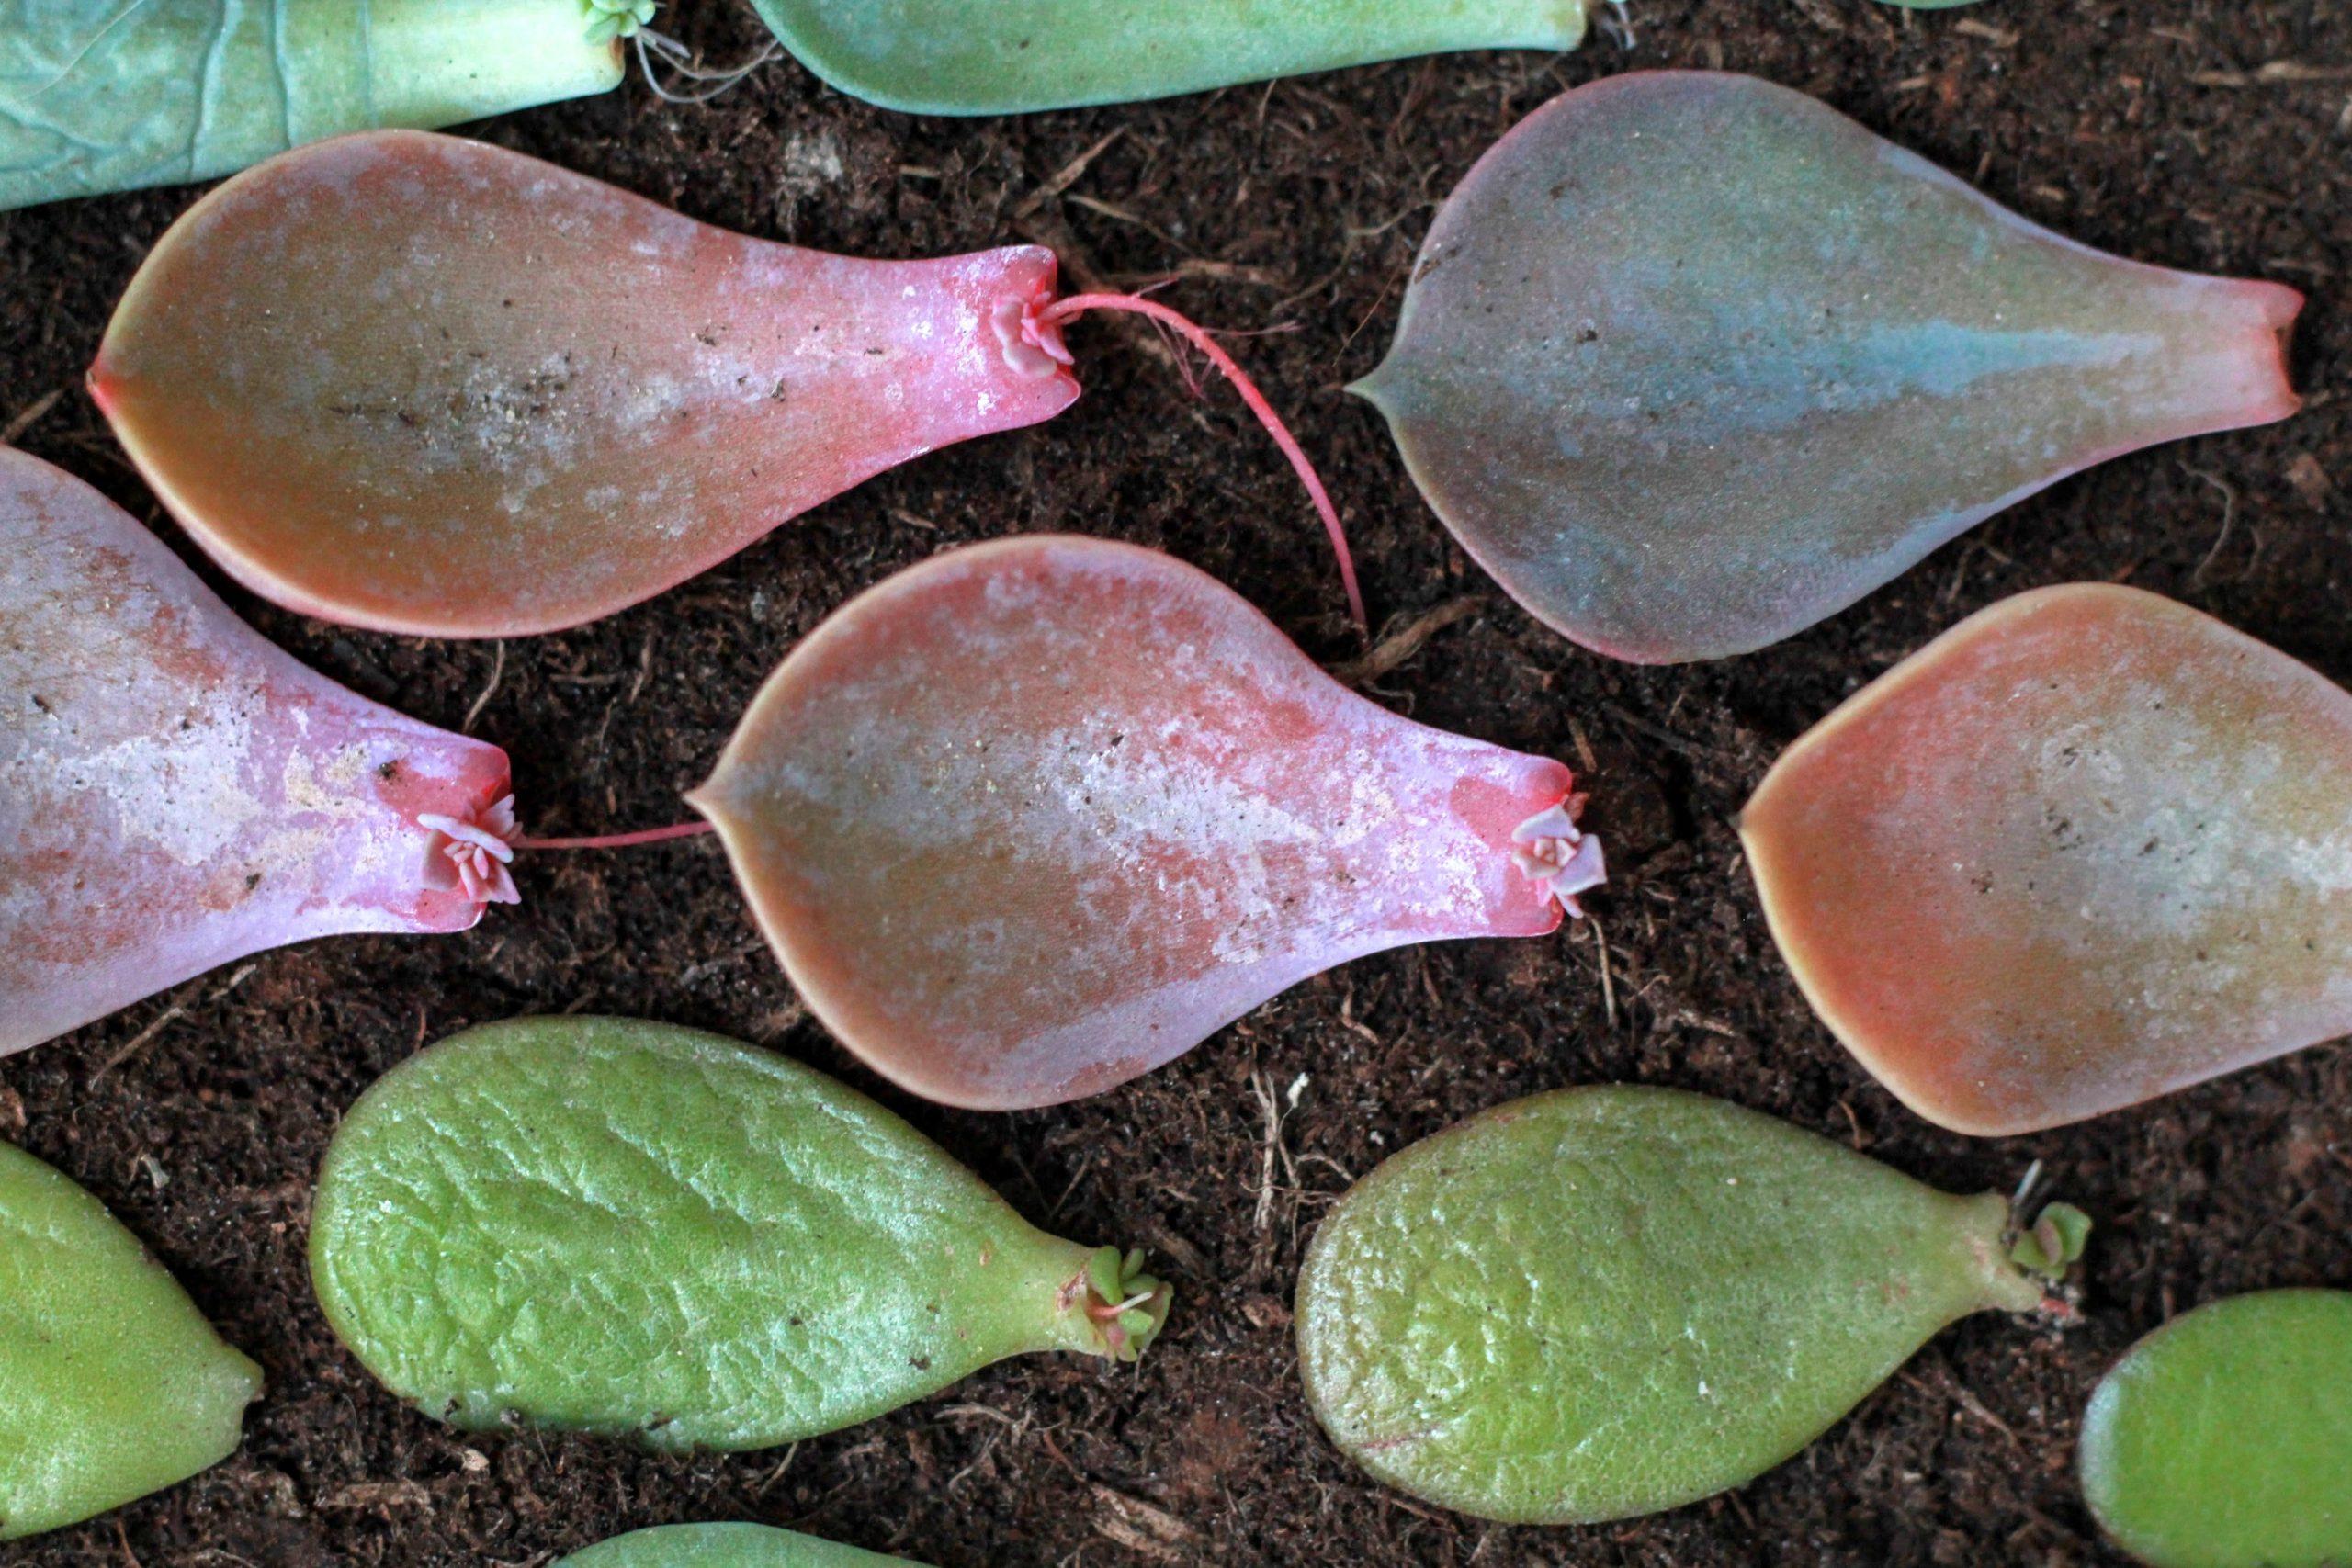 vetplant bladstek